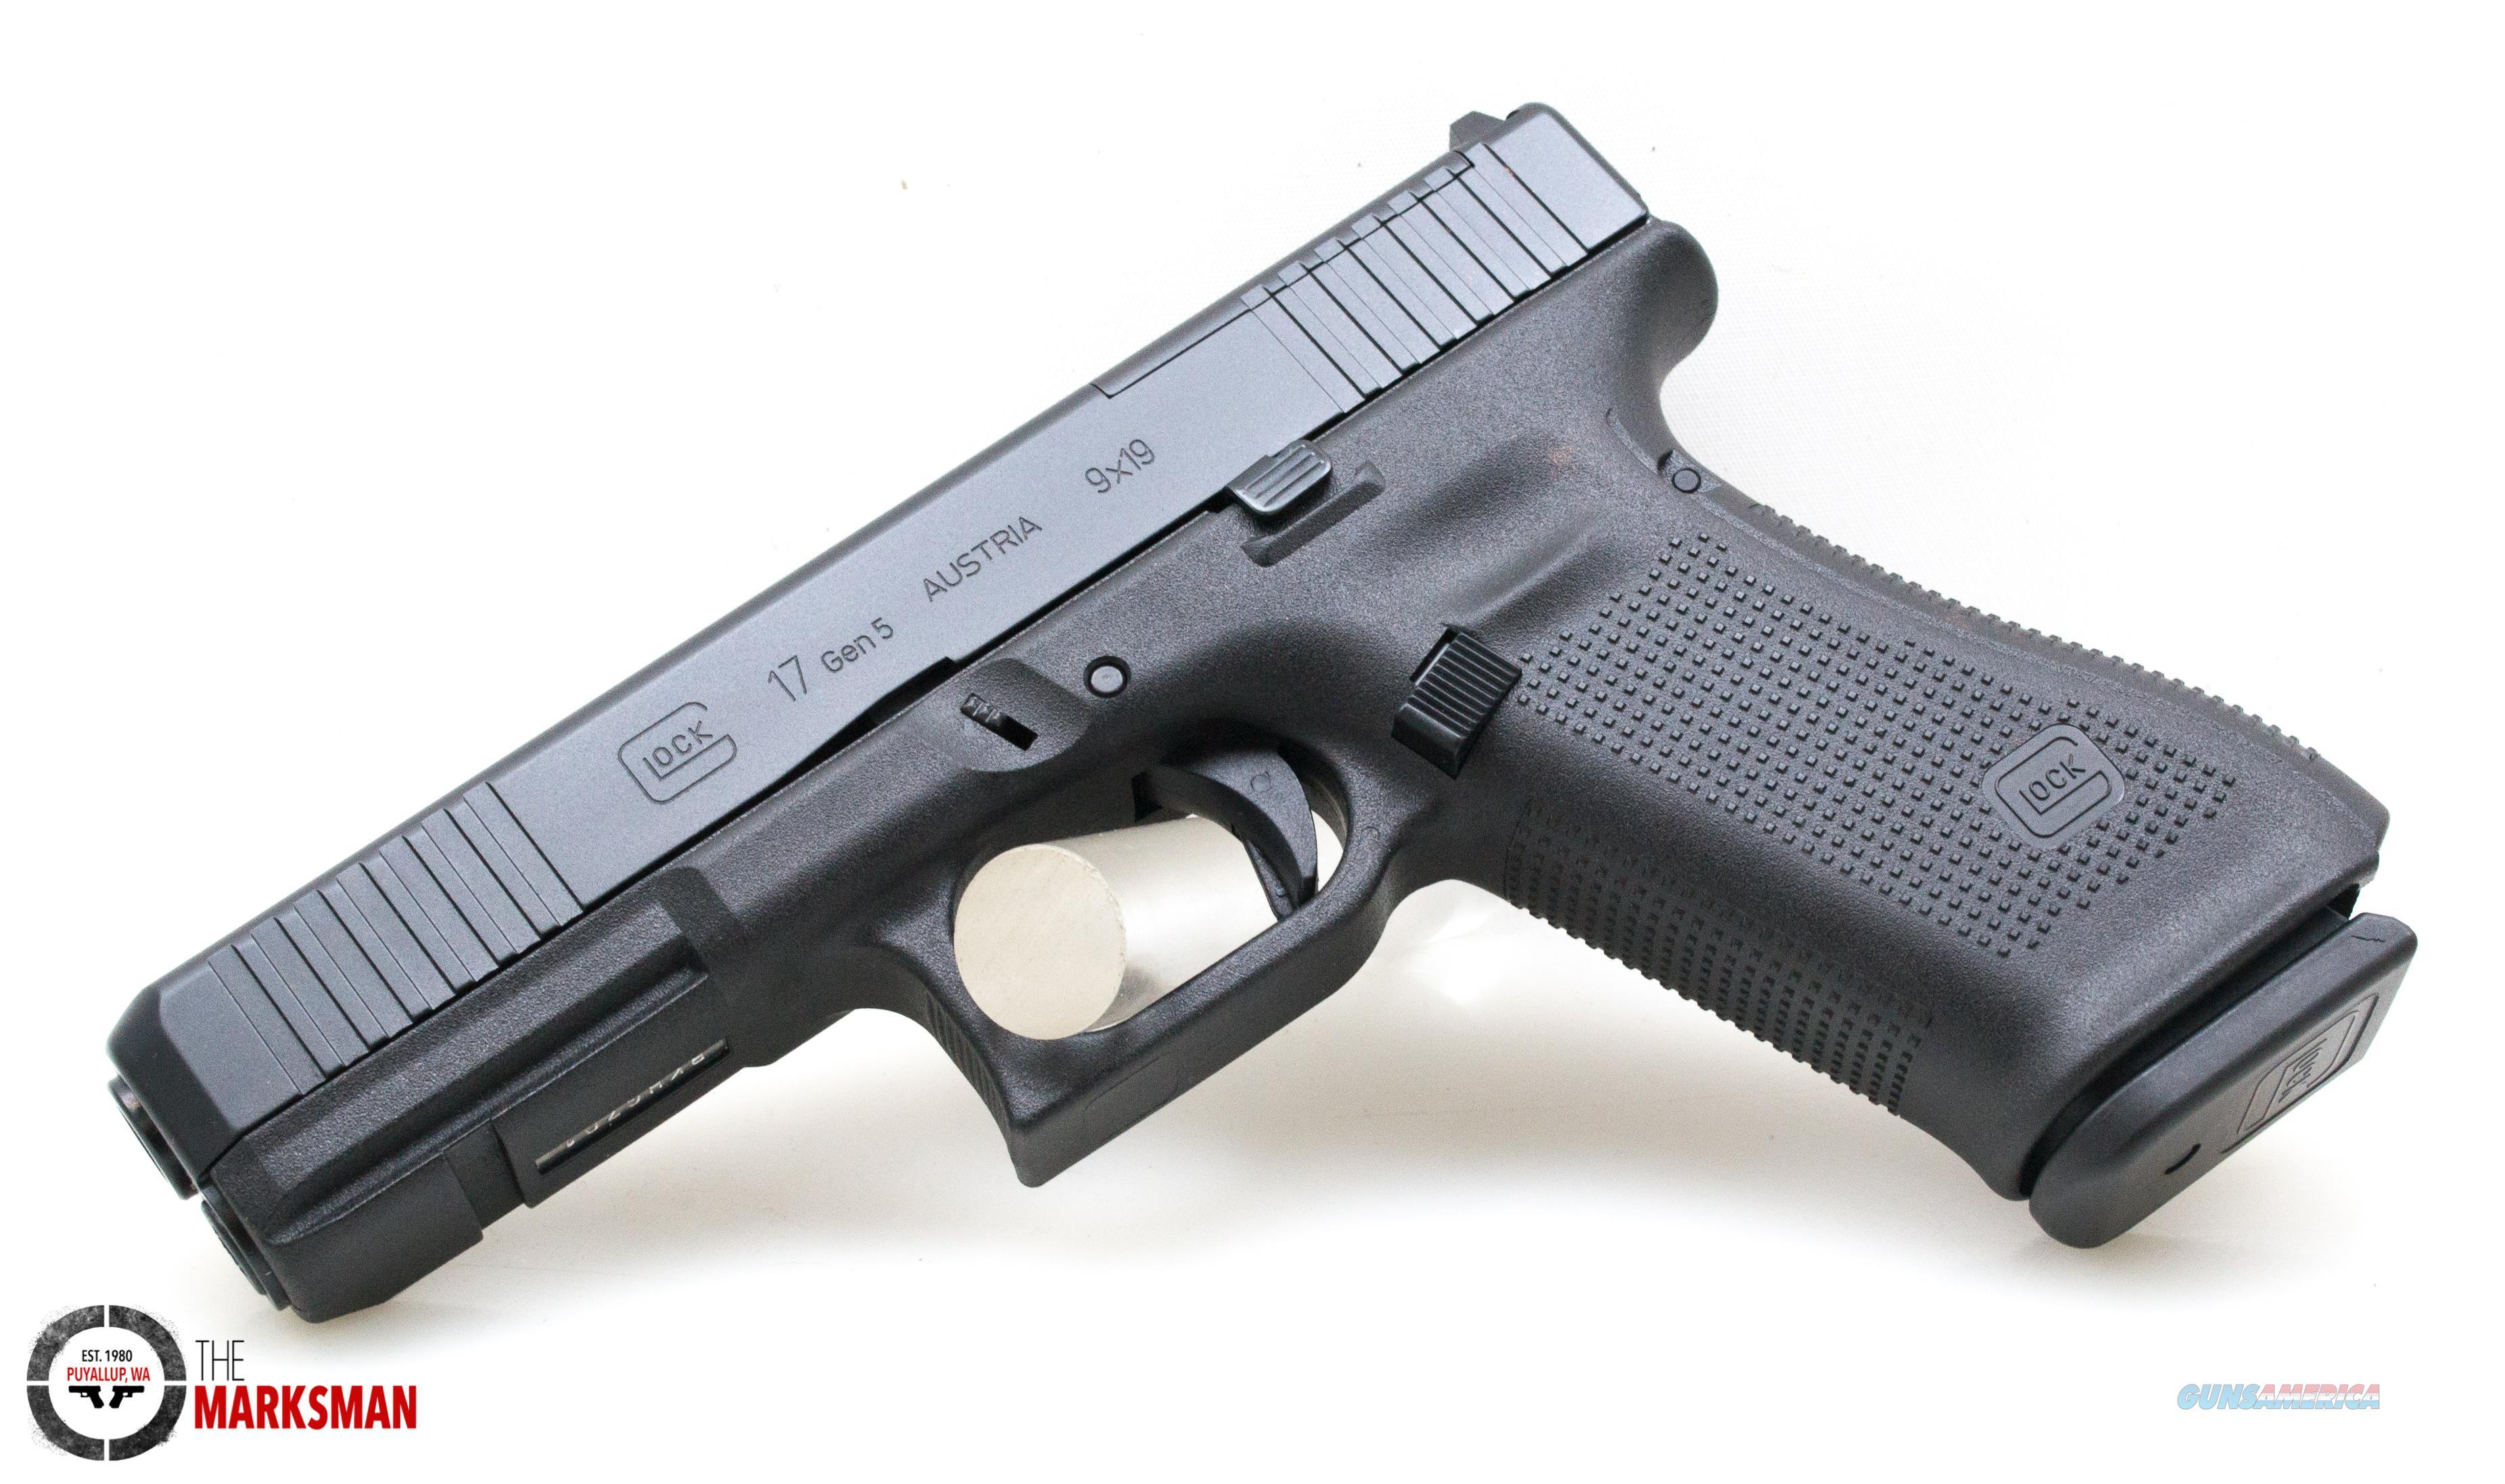 Glock 17 Generation 5 MOS, 9mm NEW PA175S203MOS  Guns > Pistols > Glock Pistols > 17